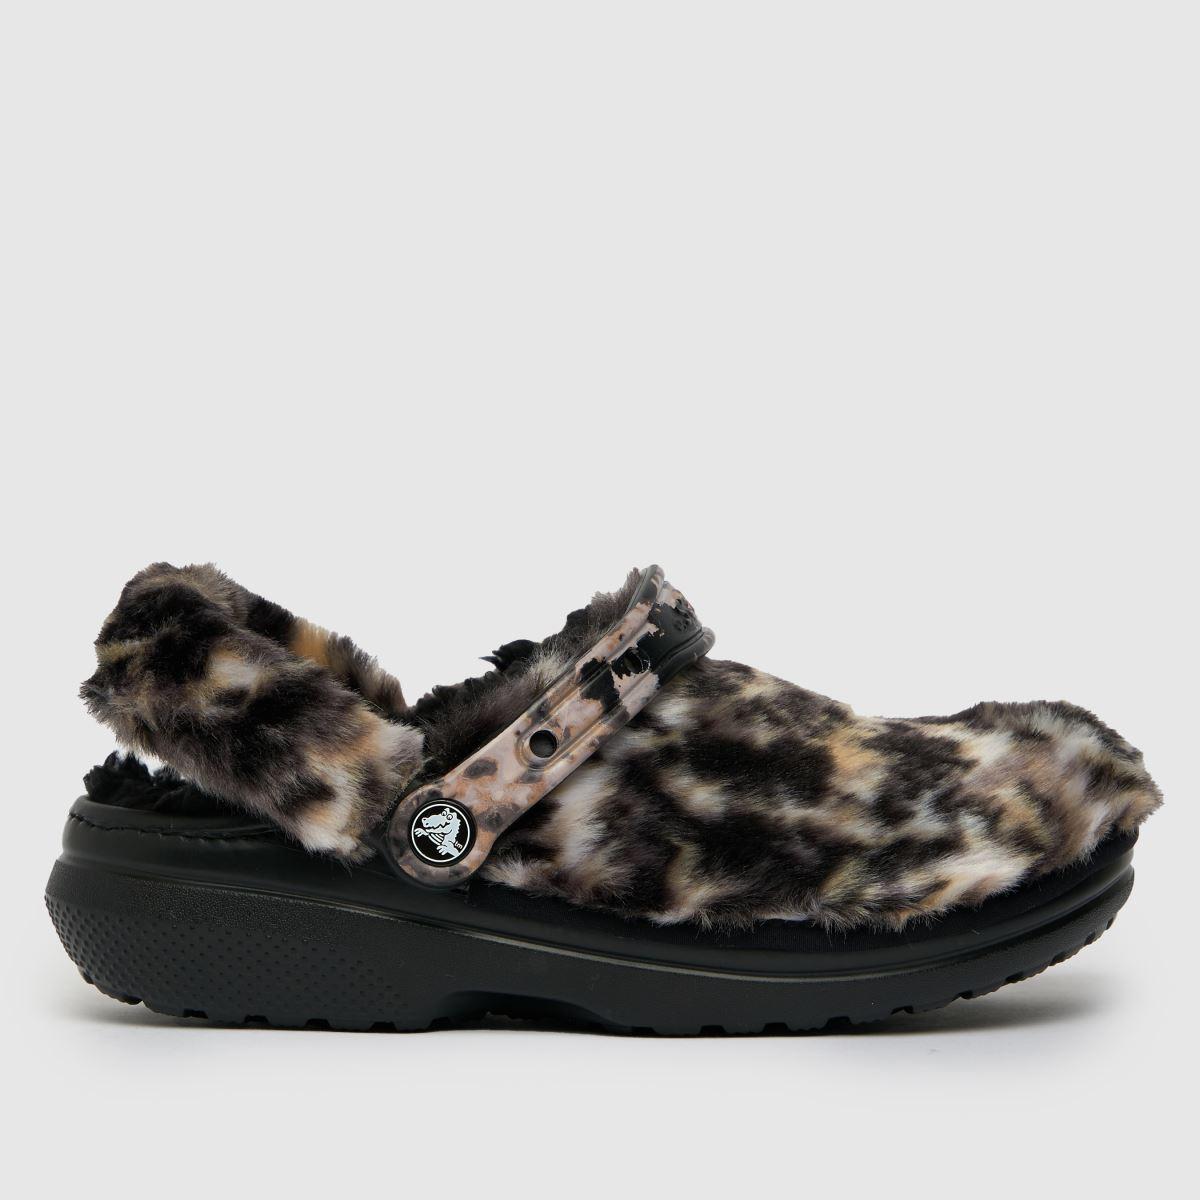 Crocs Black & Brown Classic Lined Cozy Fuzz Sandals